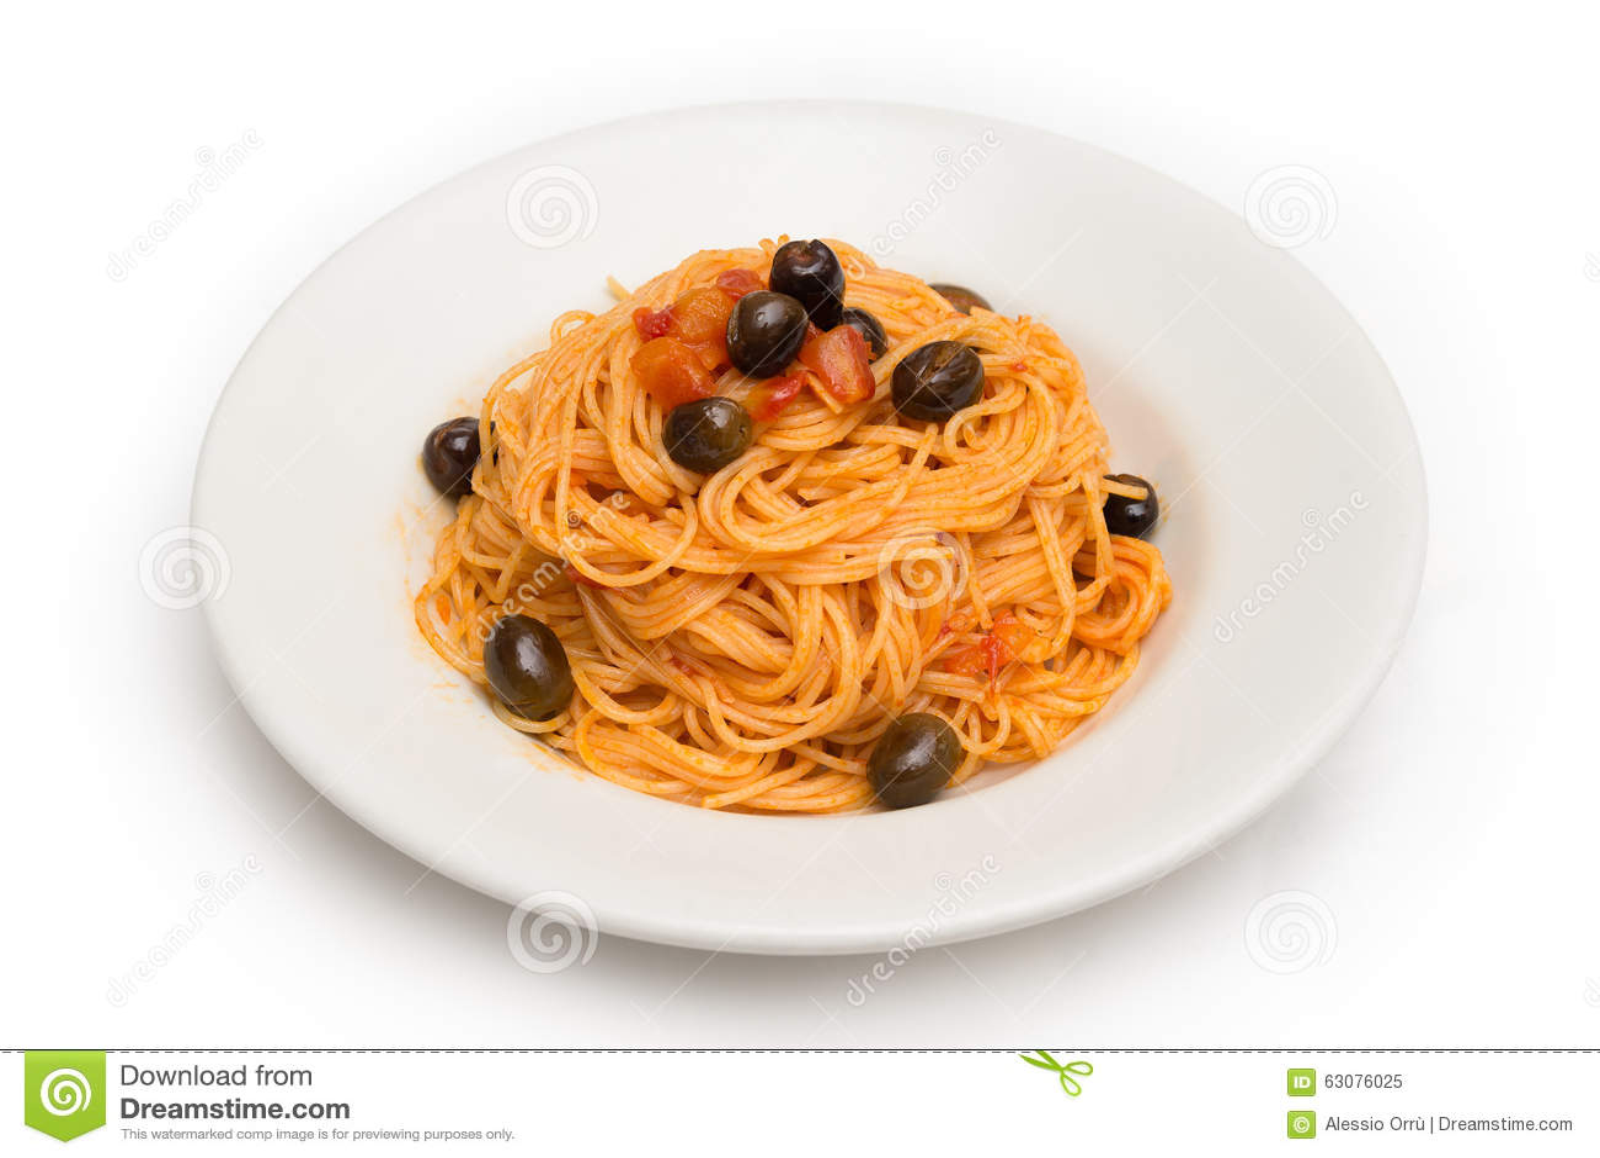 Download Spaghetti Avec De La Sauce à Agropiccante Image stock - Image du assiette, tomate: 63076025